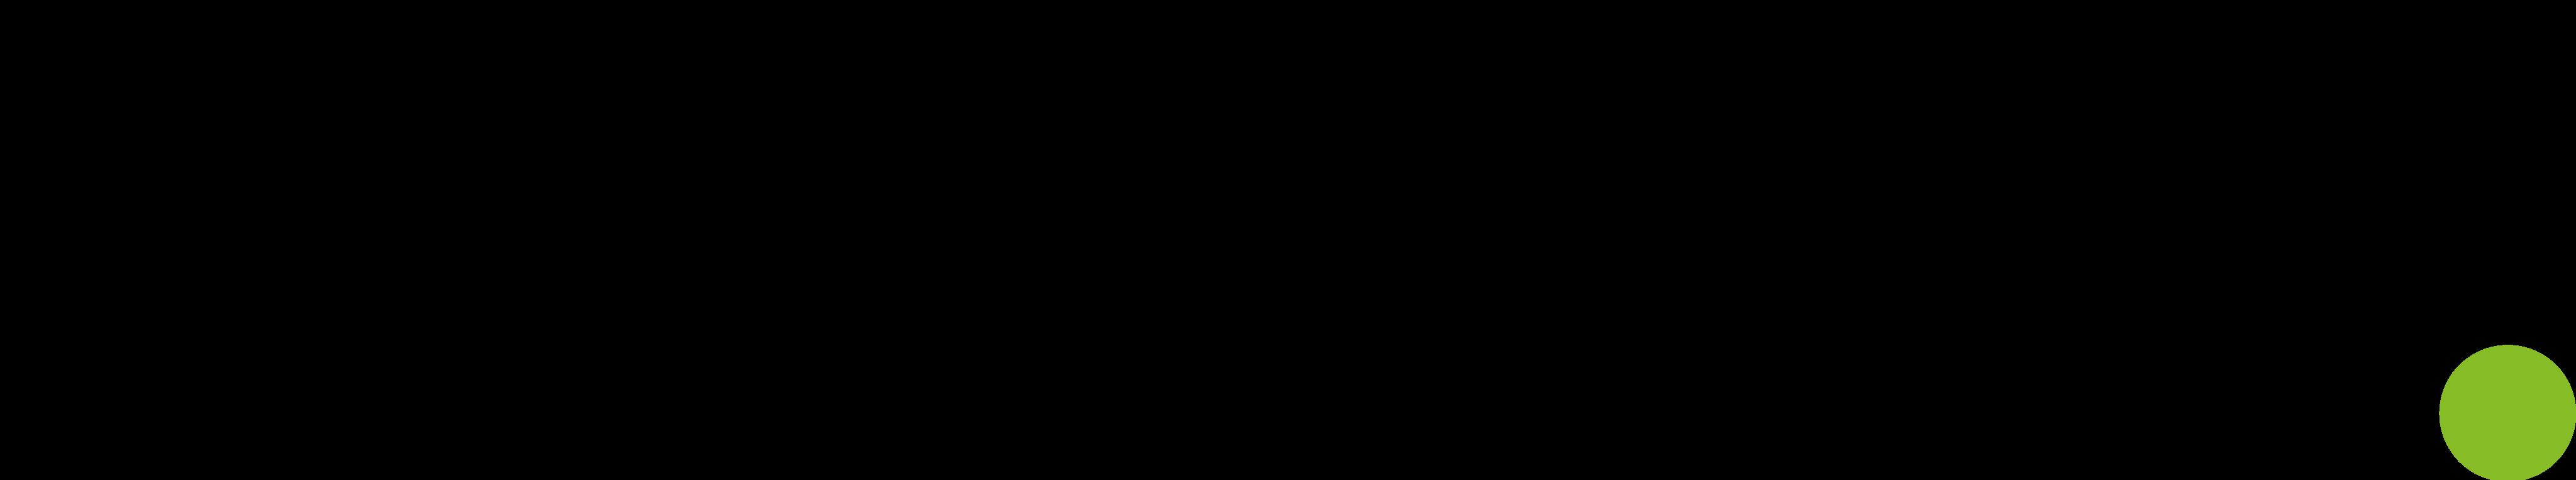 Dekoitte. Global Incubator's clients